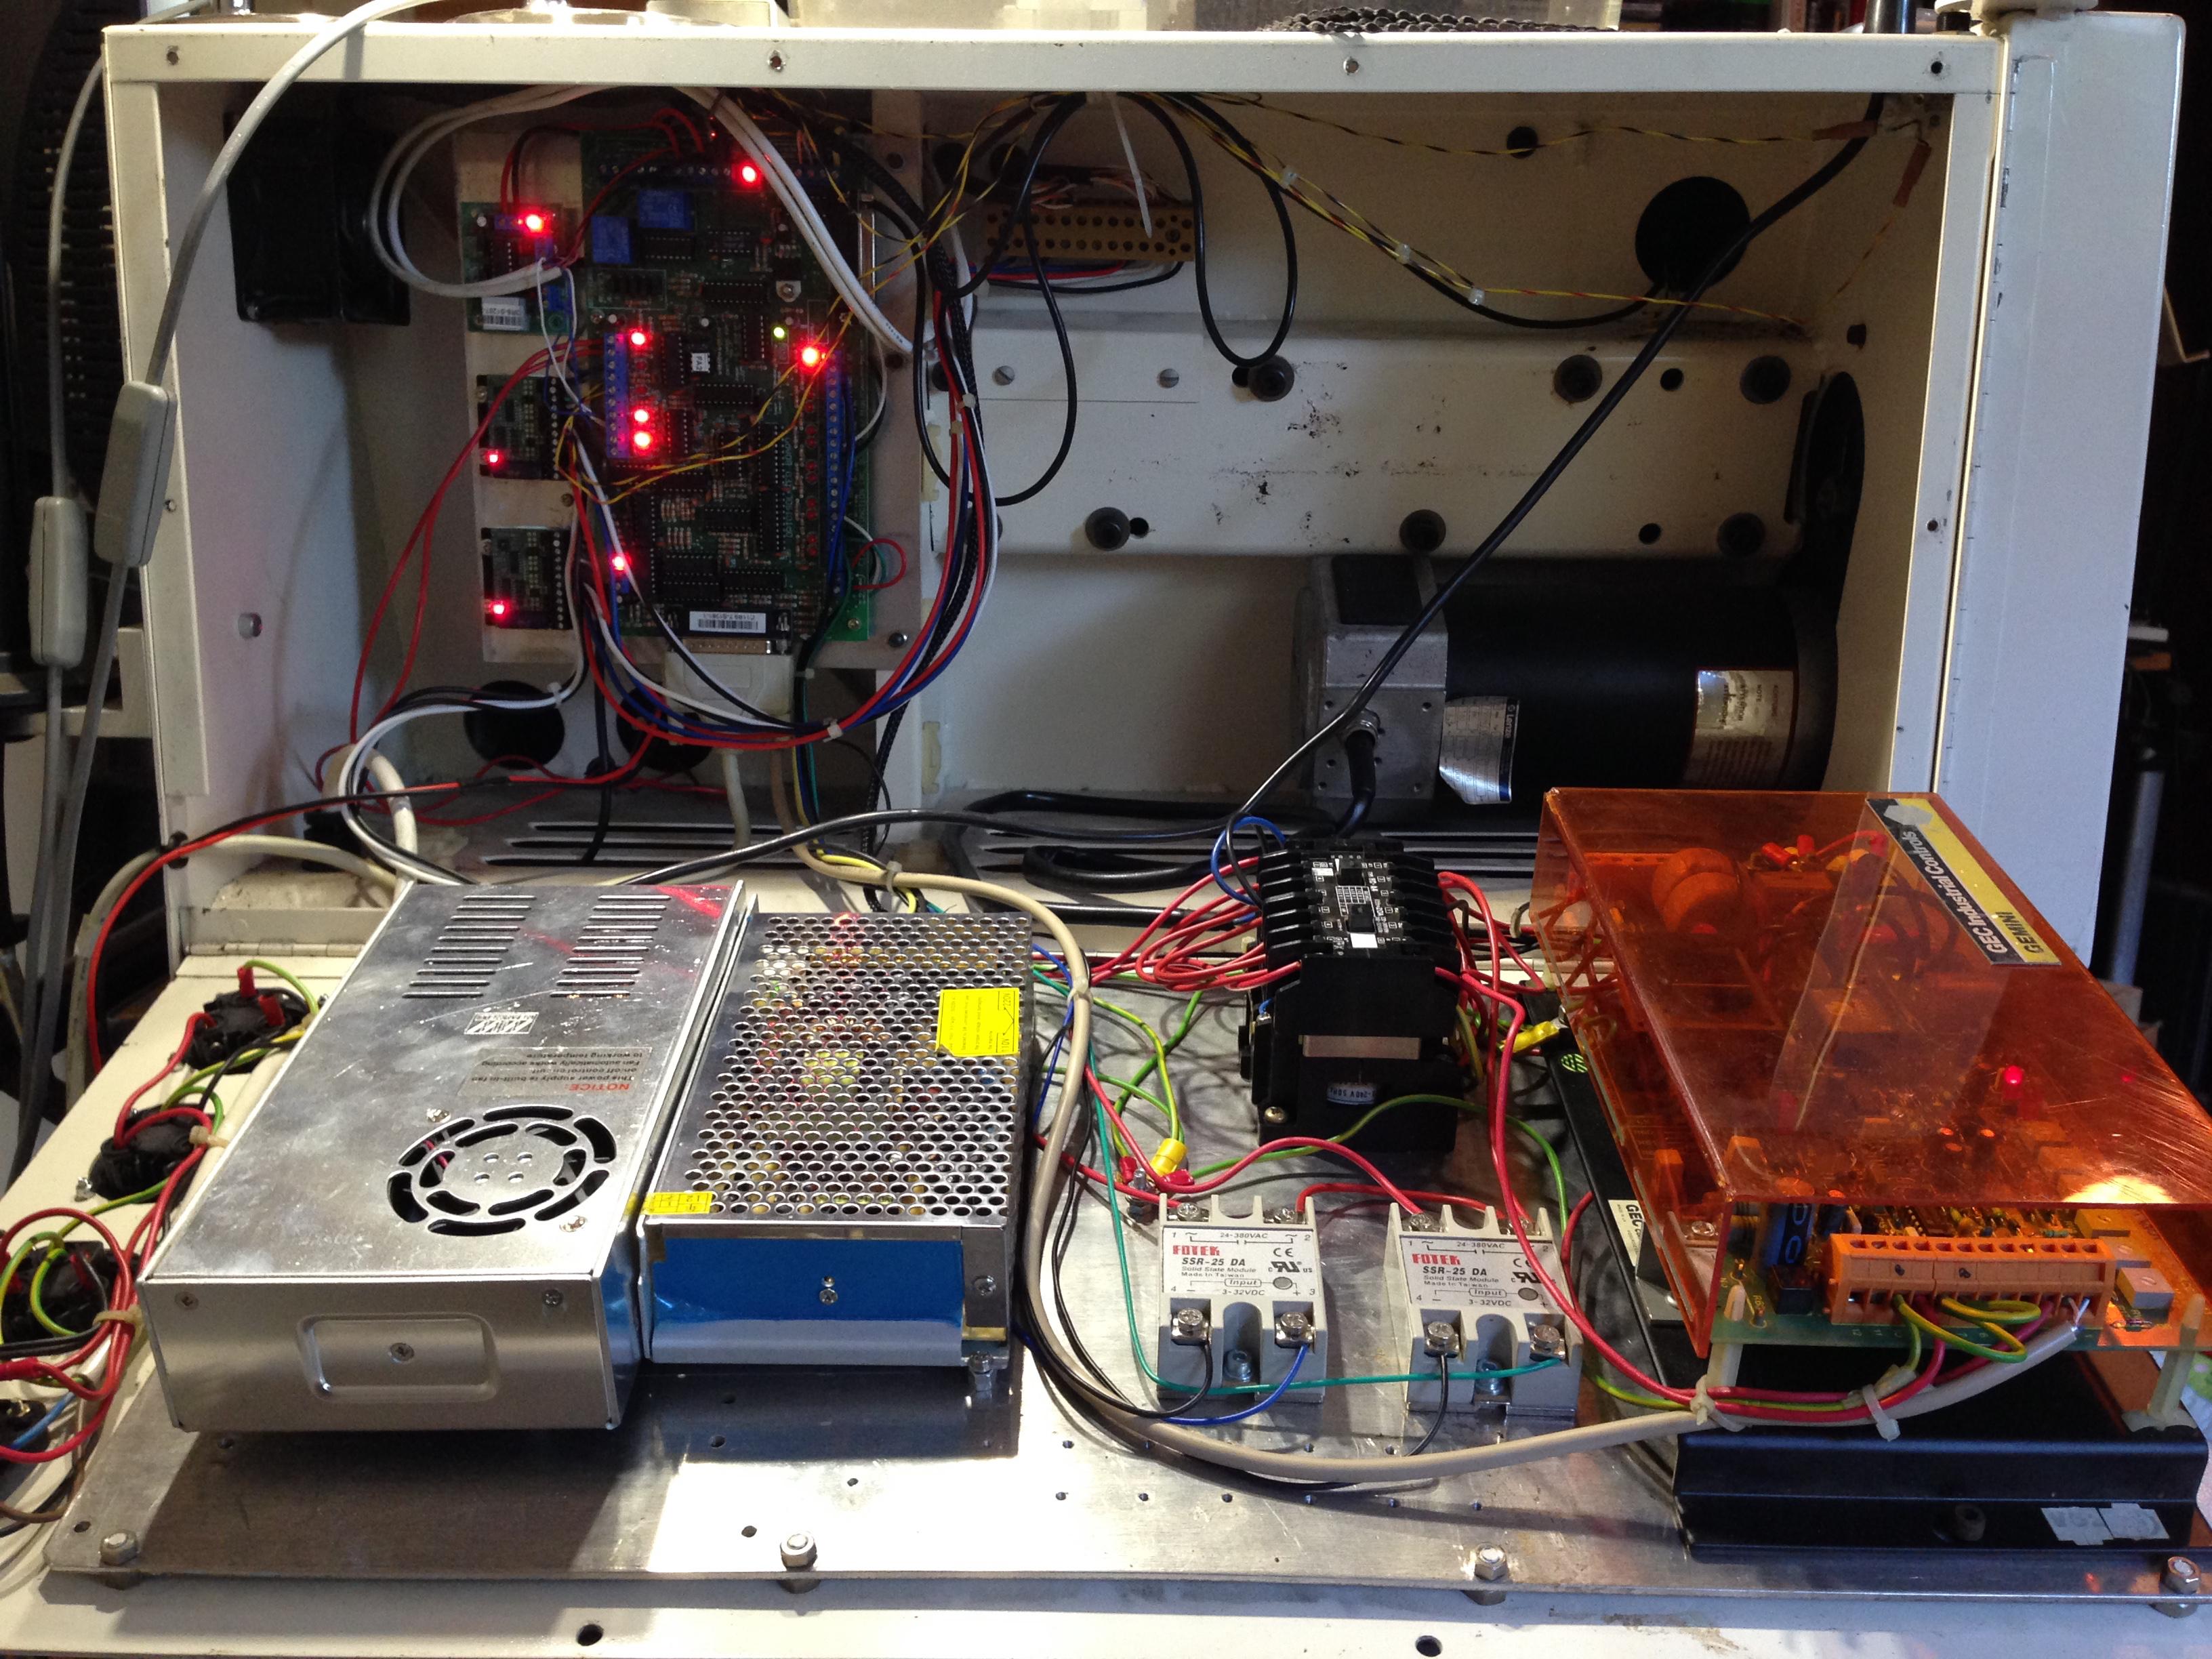 img_3345?w=350&h=200&crop=1 boxford cnc lathe johnsmachines Basic Electrical Wiring Diagrams at fashall.co